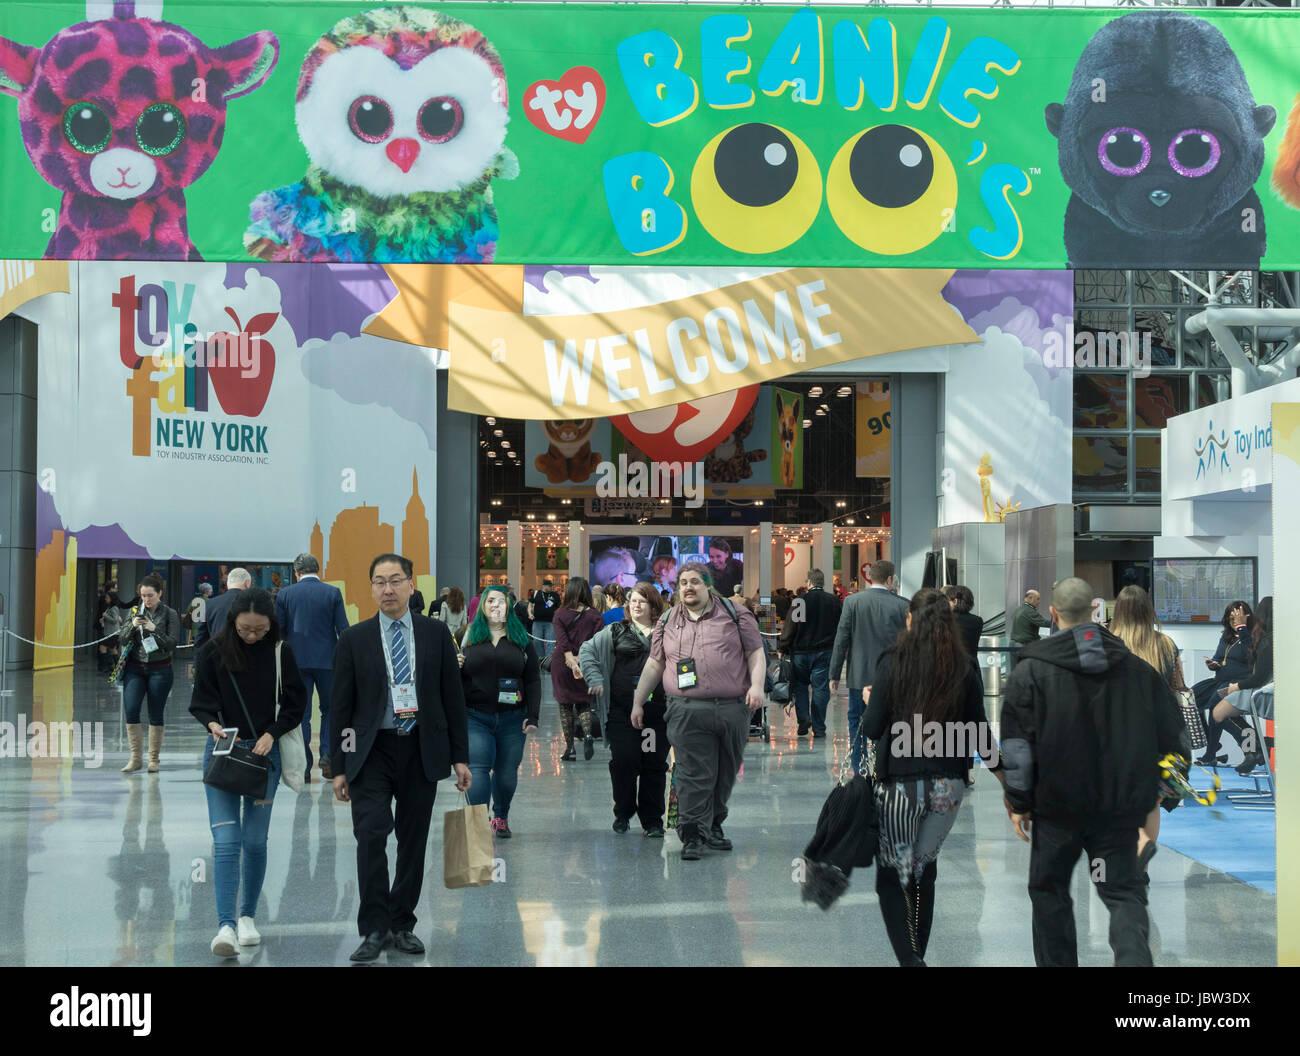 American International Toy Fair, Jacob K. Javits Convention Center, Manhattan, New York City, USA Stock Photo